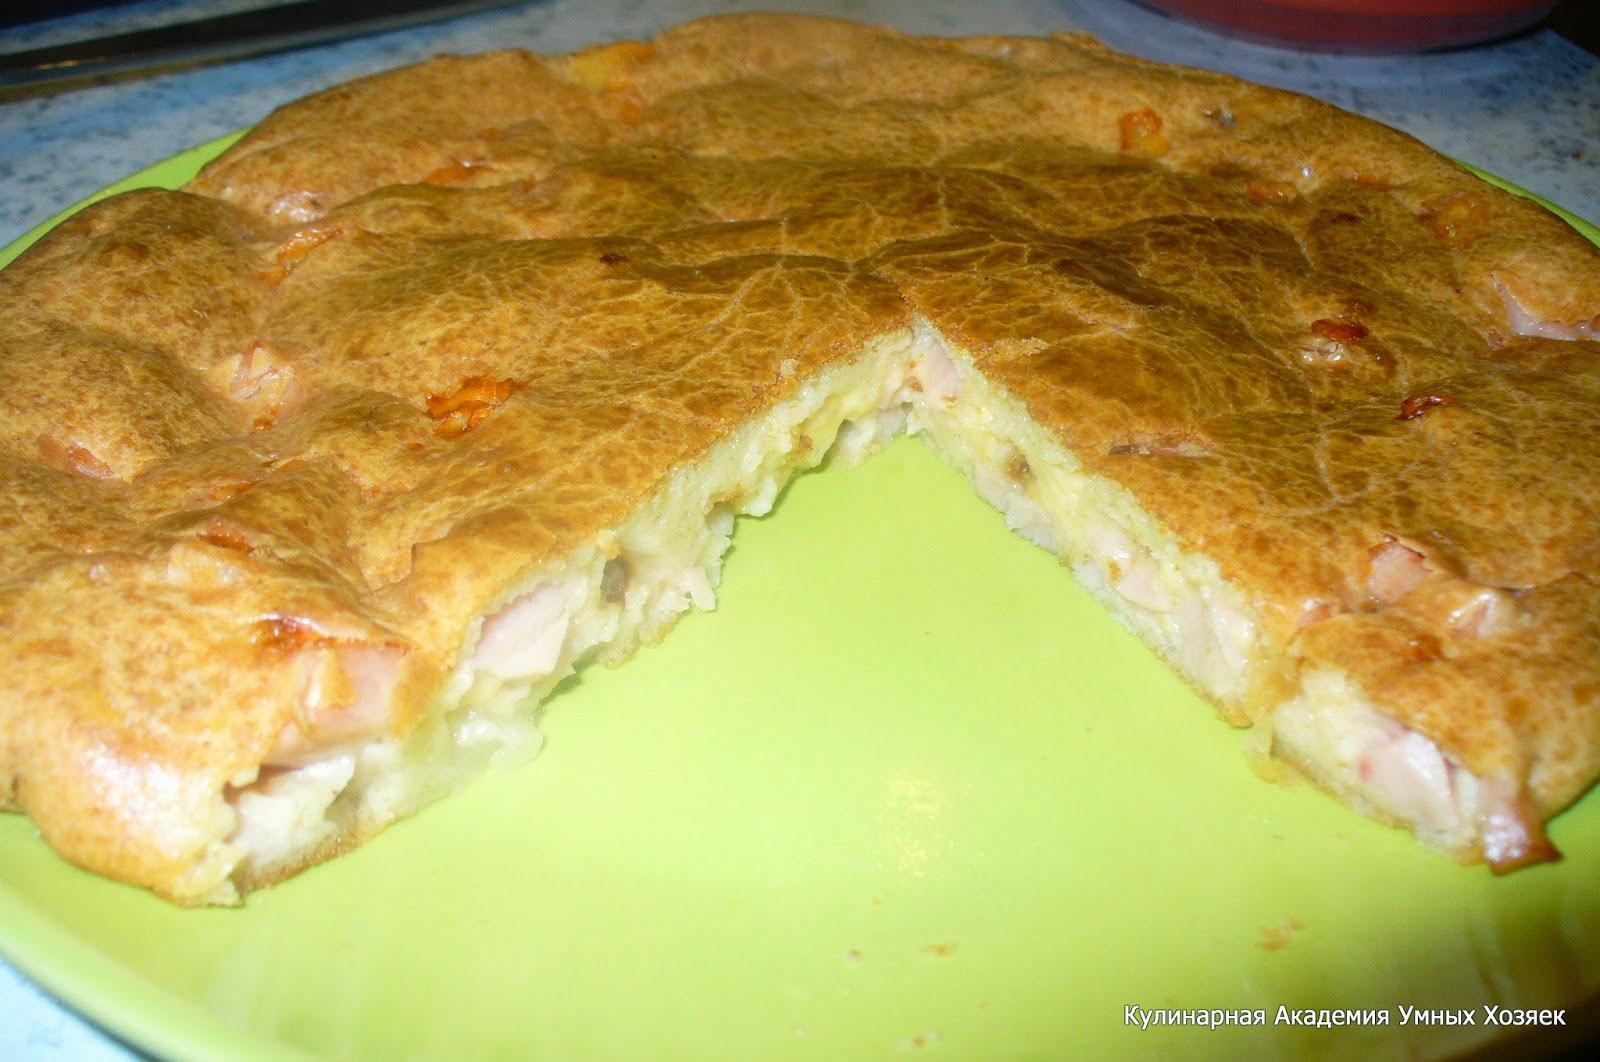 Пироги с капустой, рецепты с фото от 74